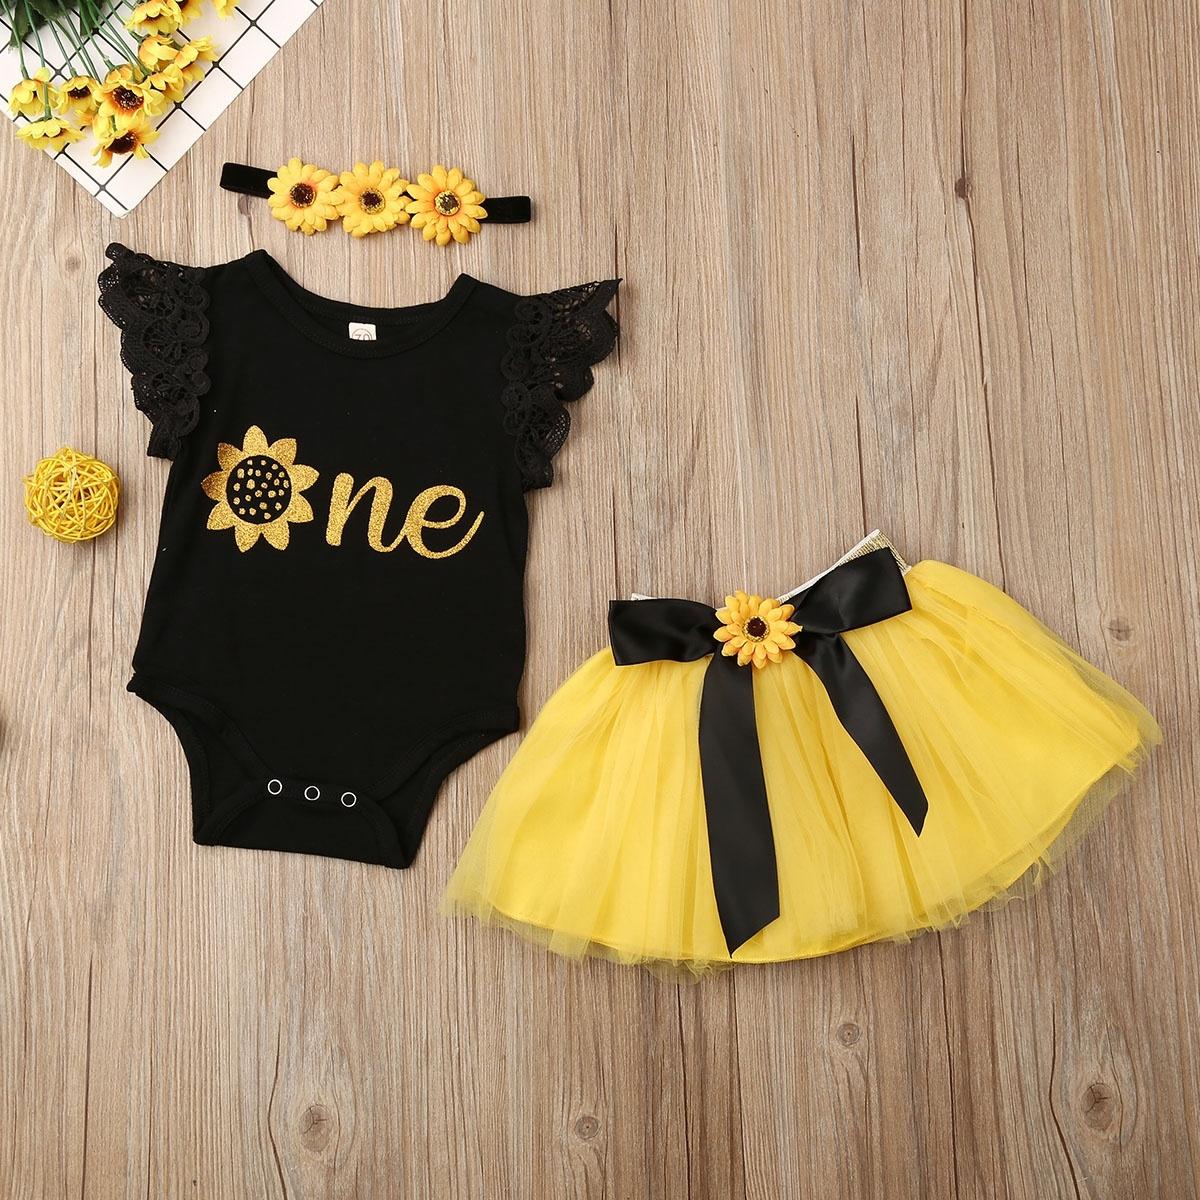 Toddler Baby Girls 1st Birthday Outfits Princess Romper Tutu Skirt Headband Set Walmart Canada